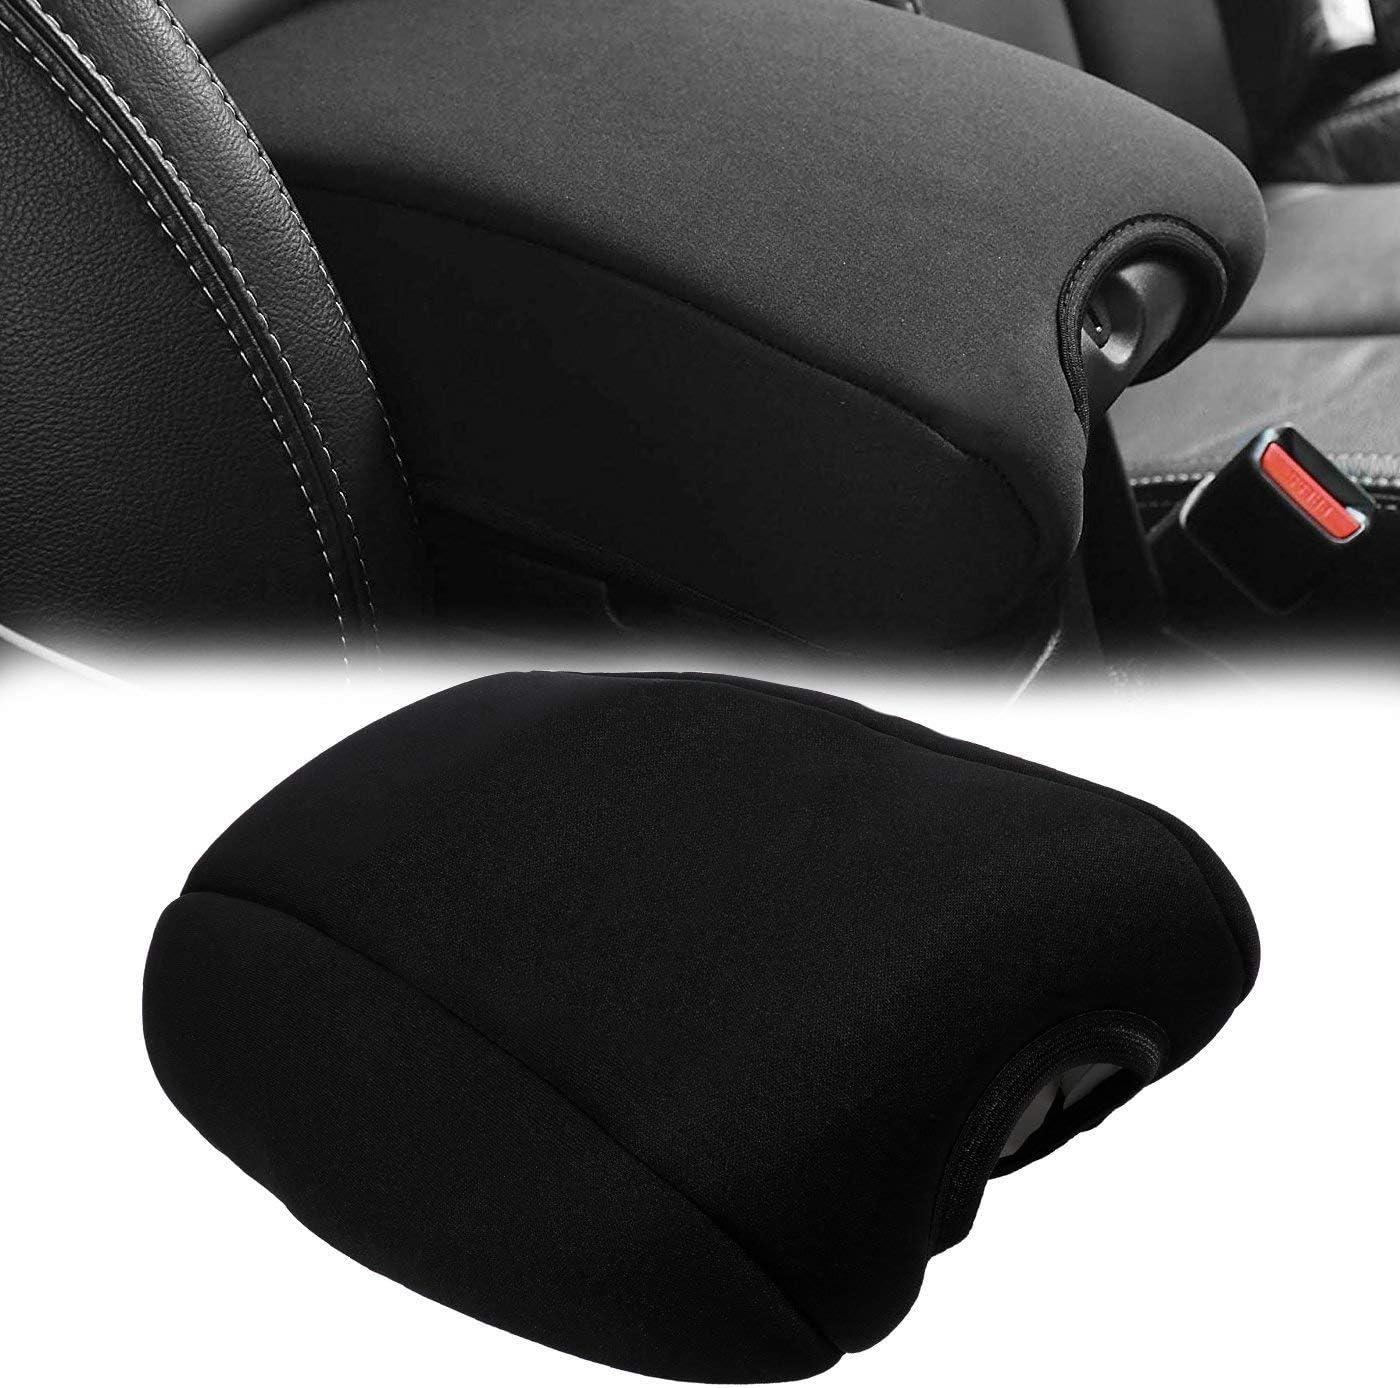 Sunluway Center Console Armrest Pad Cover Neoprene Protector Cushion Car Seat Side Pocket Storage Organizer for Jeep Wrangler JK JKU Sahara Sport Rubicon x Unlimited 2011-2018